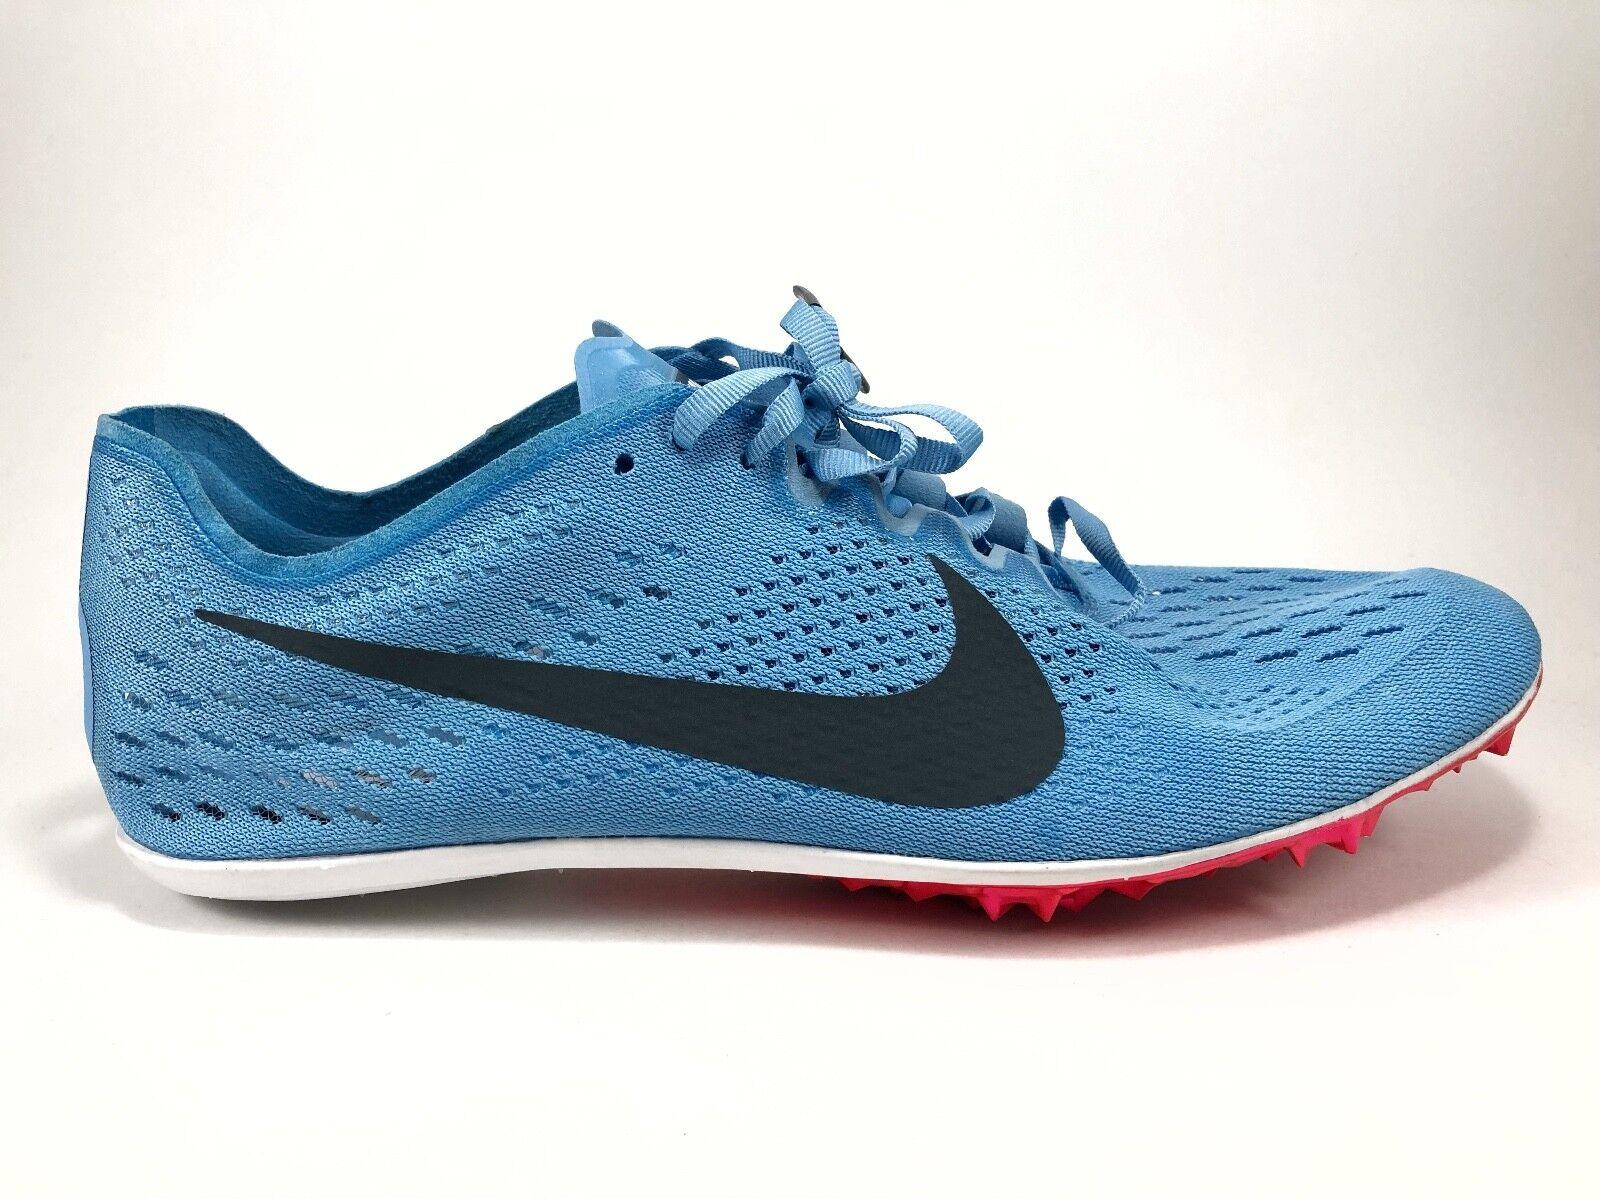 Nike Zoom Victory Elite Elite Elite Distance 1500m - 5K Track Spikes bluee Size  Mens 6.5 238891